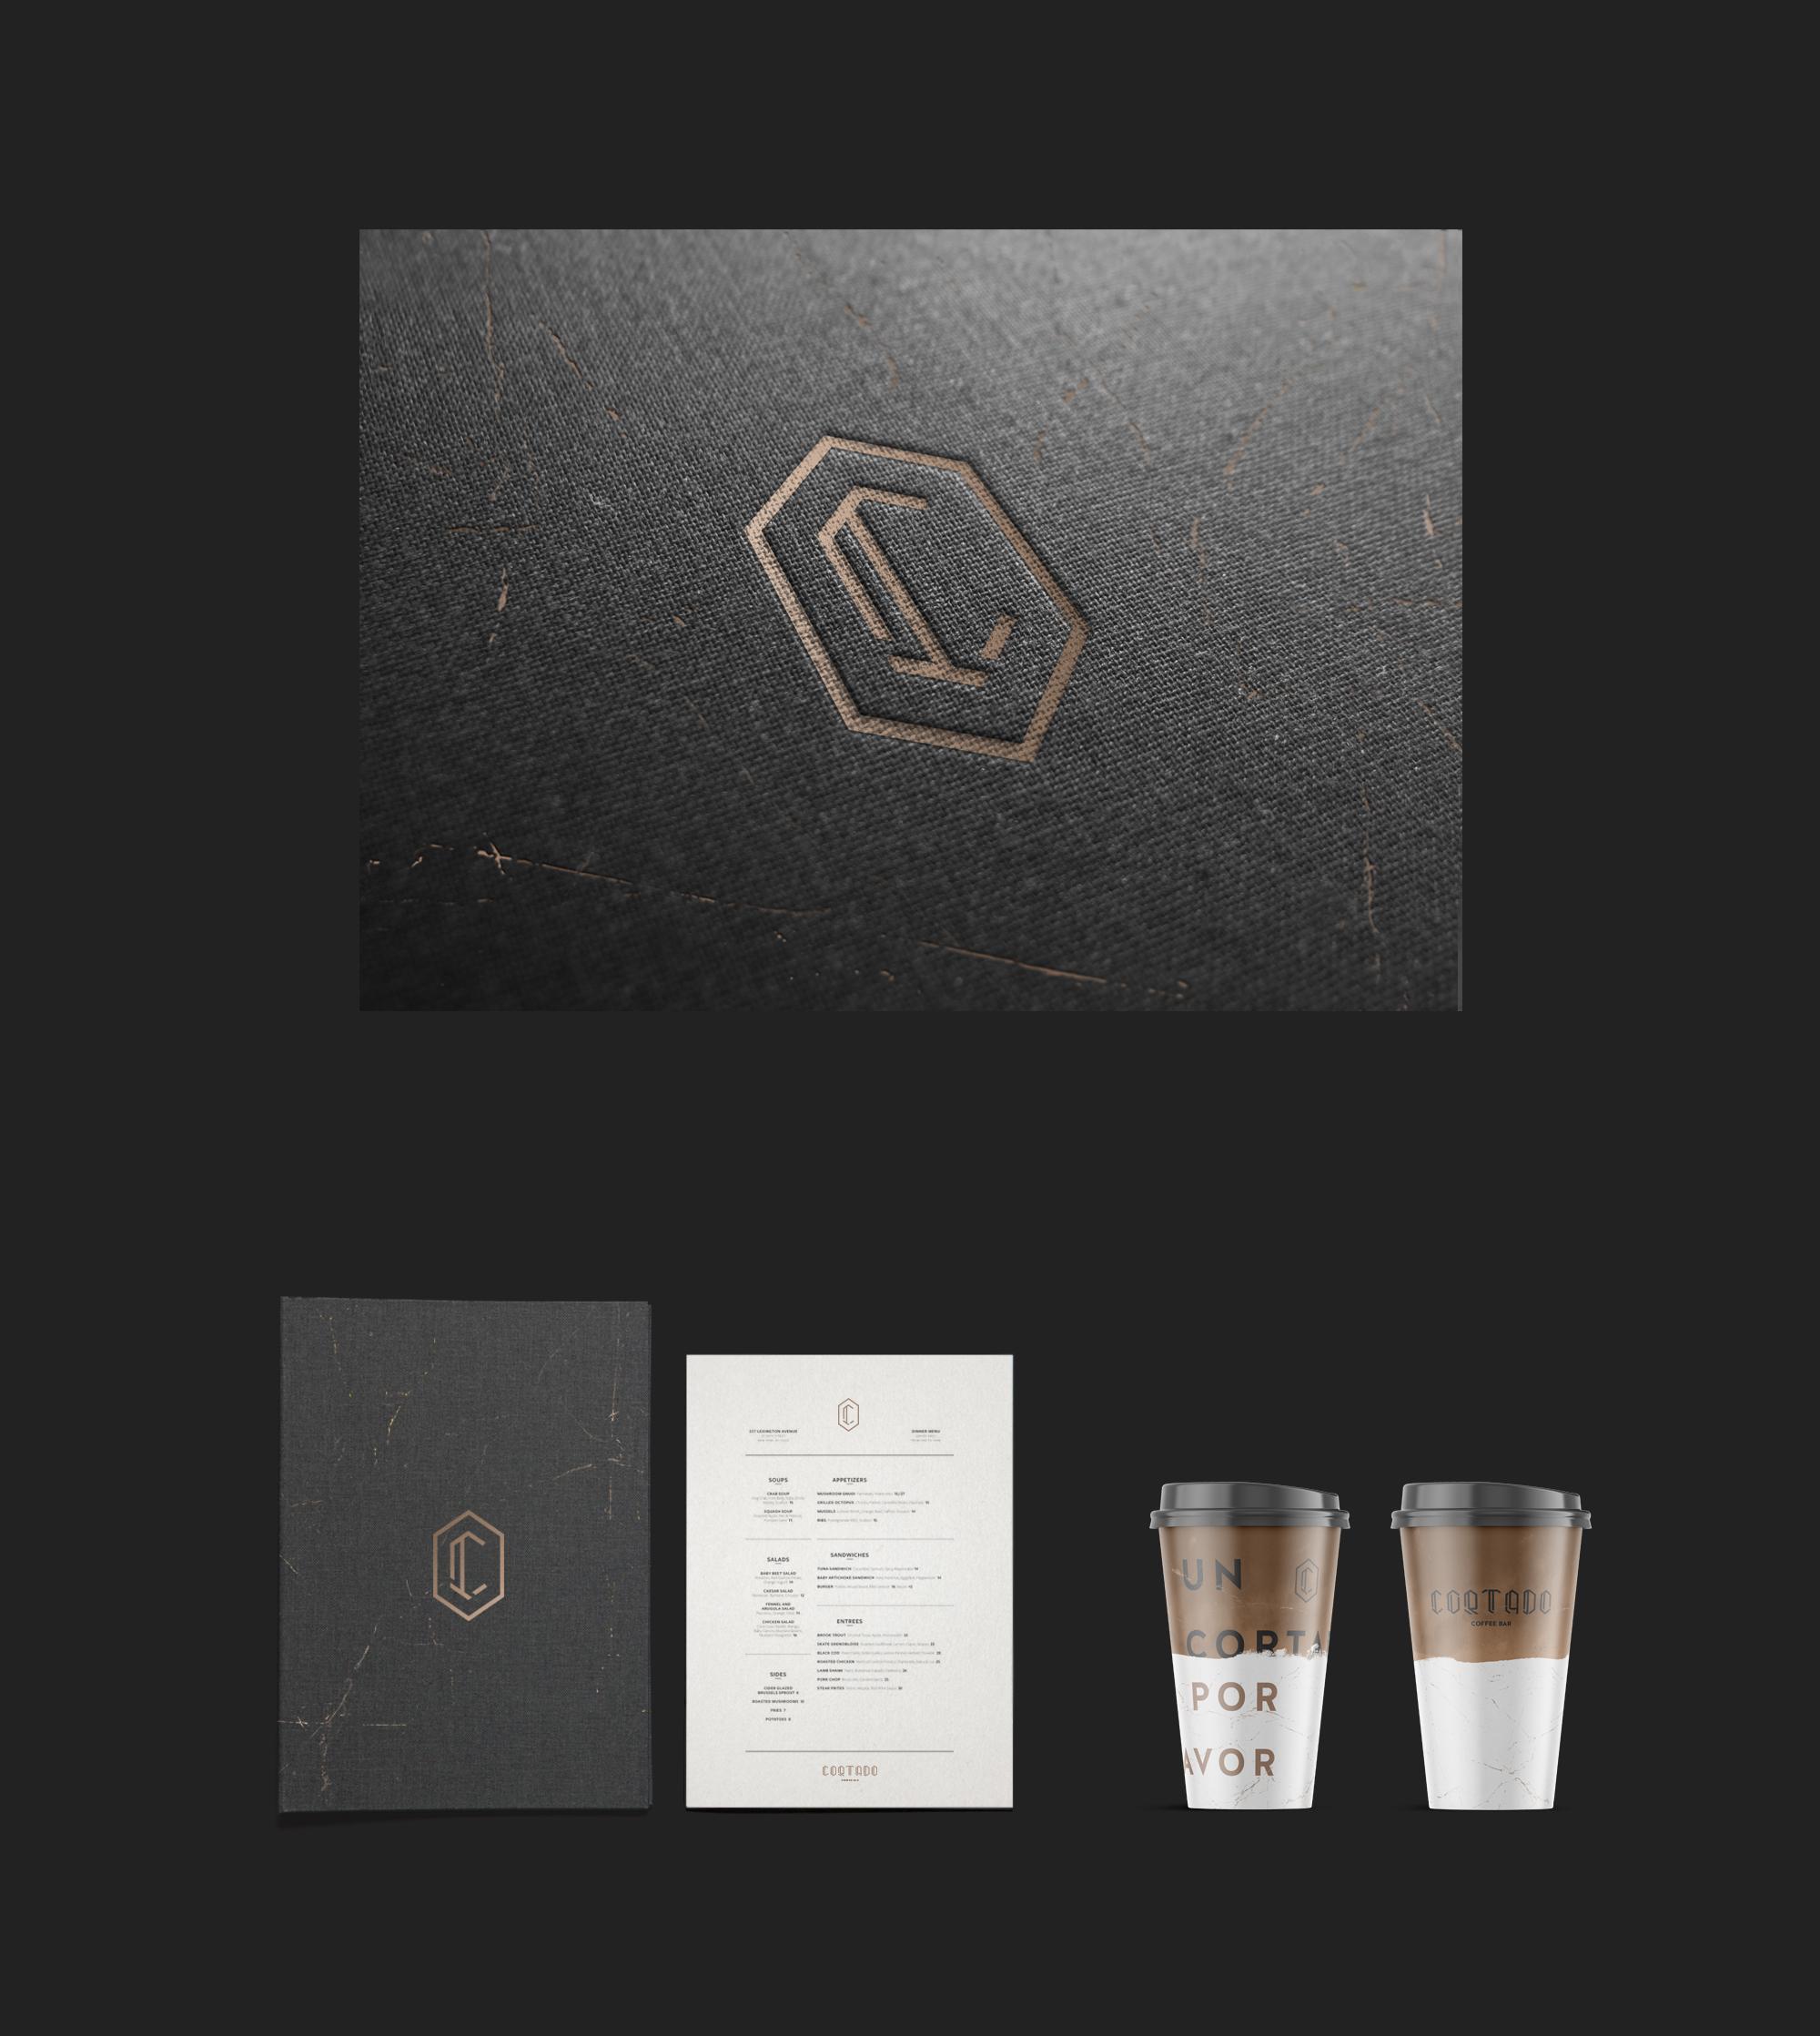 The Creative Union - Cortado Coffee Bar Branding3.jpg